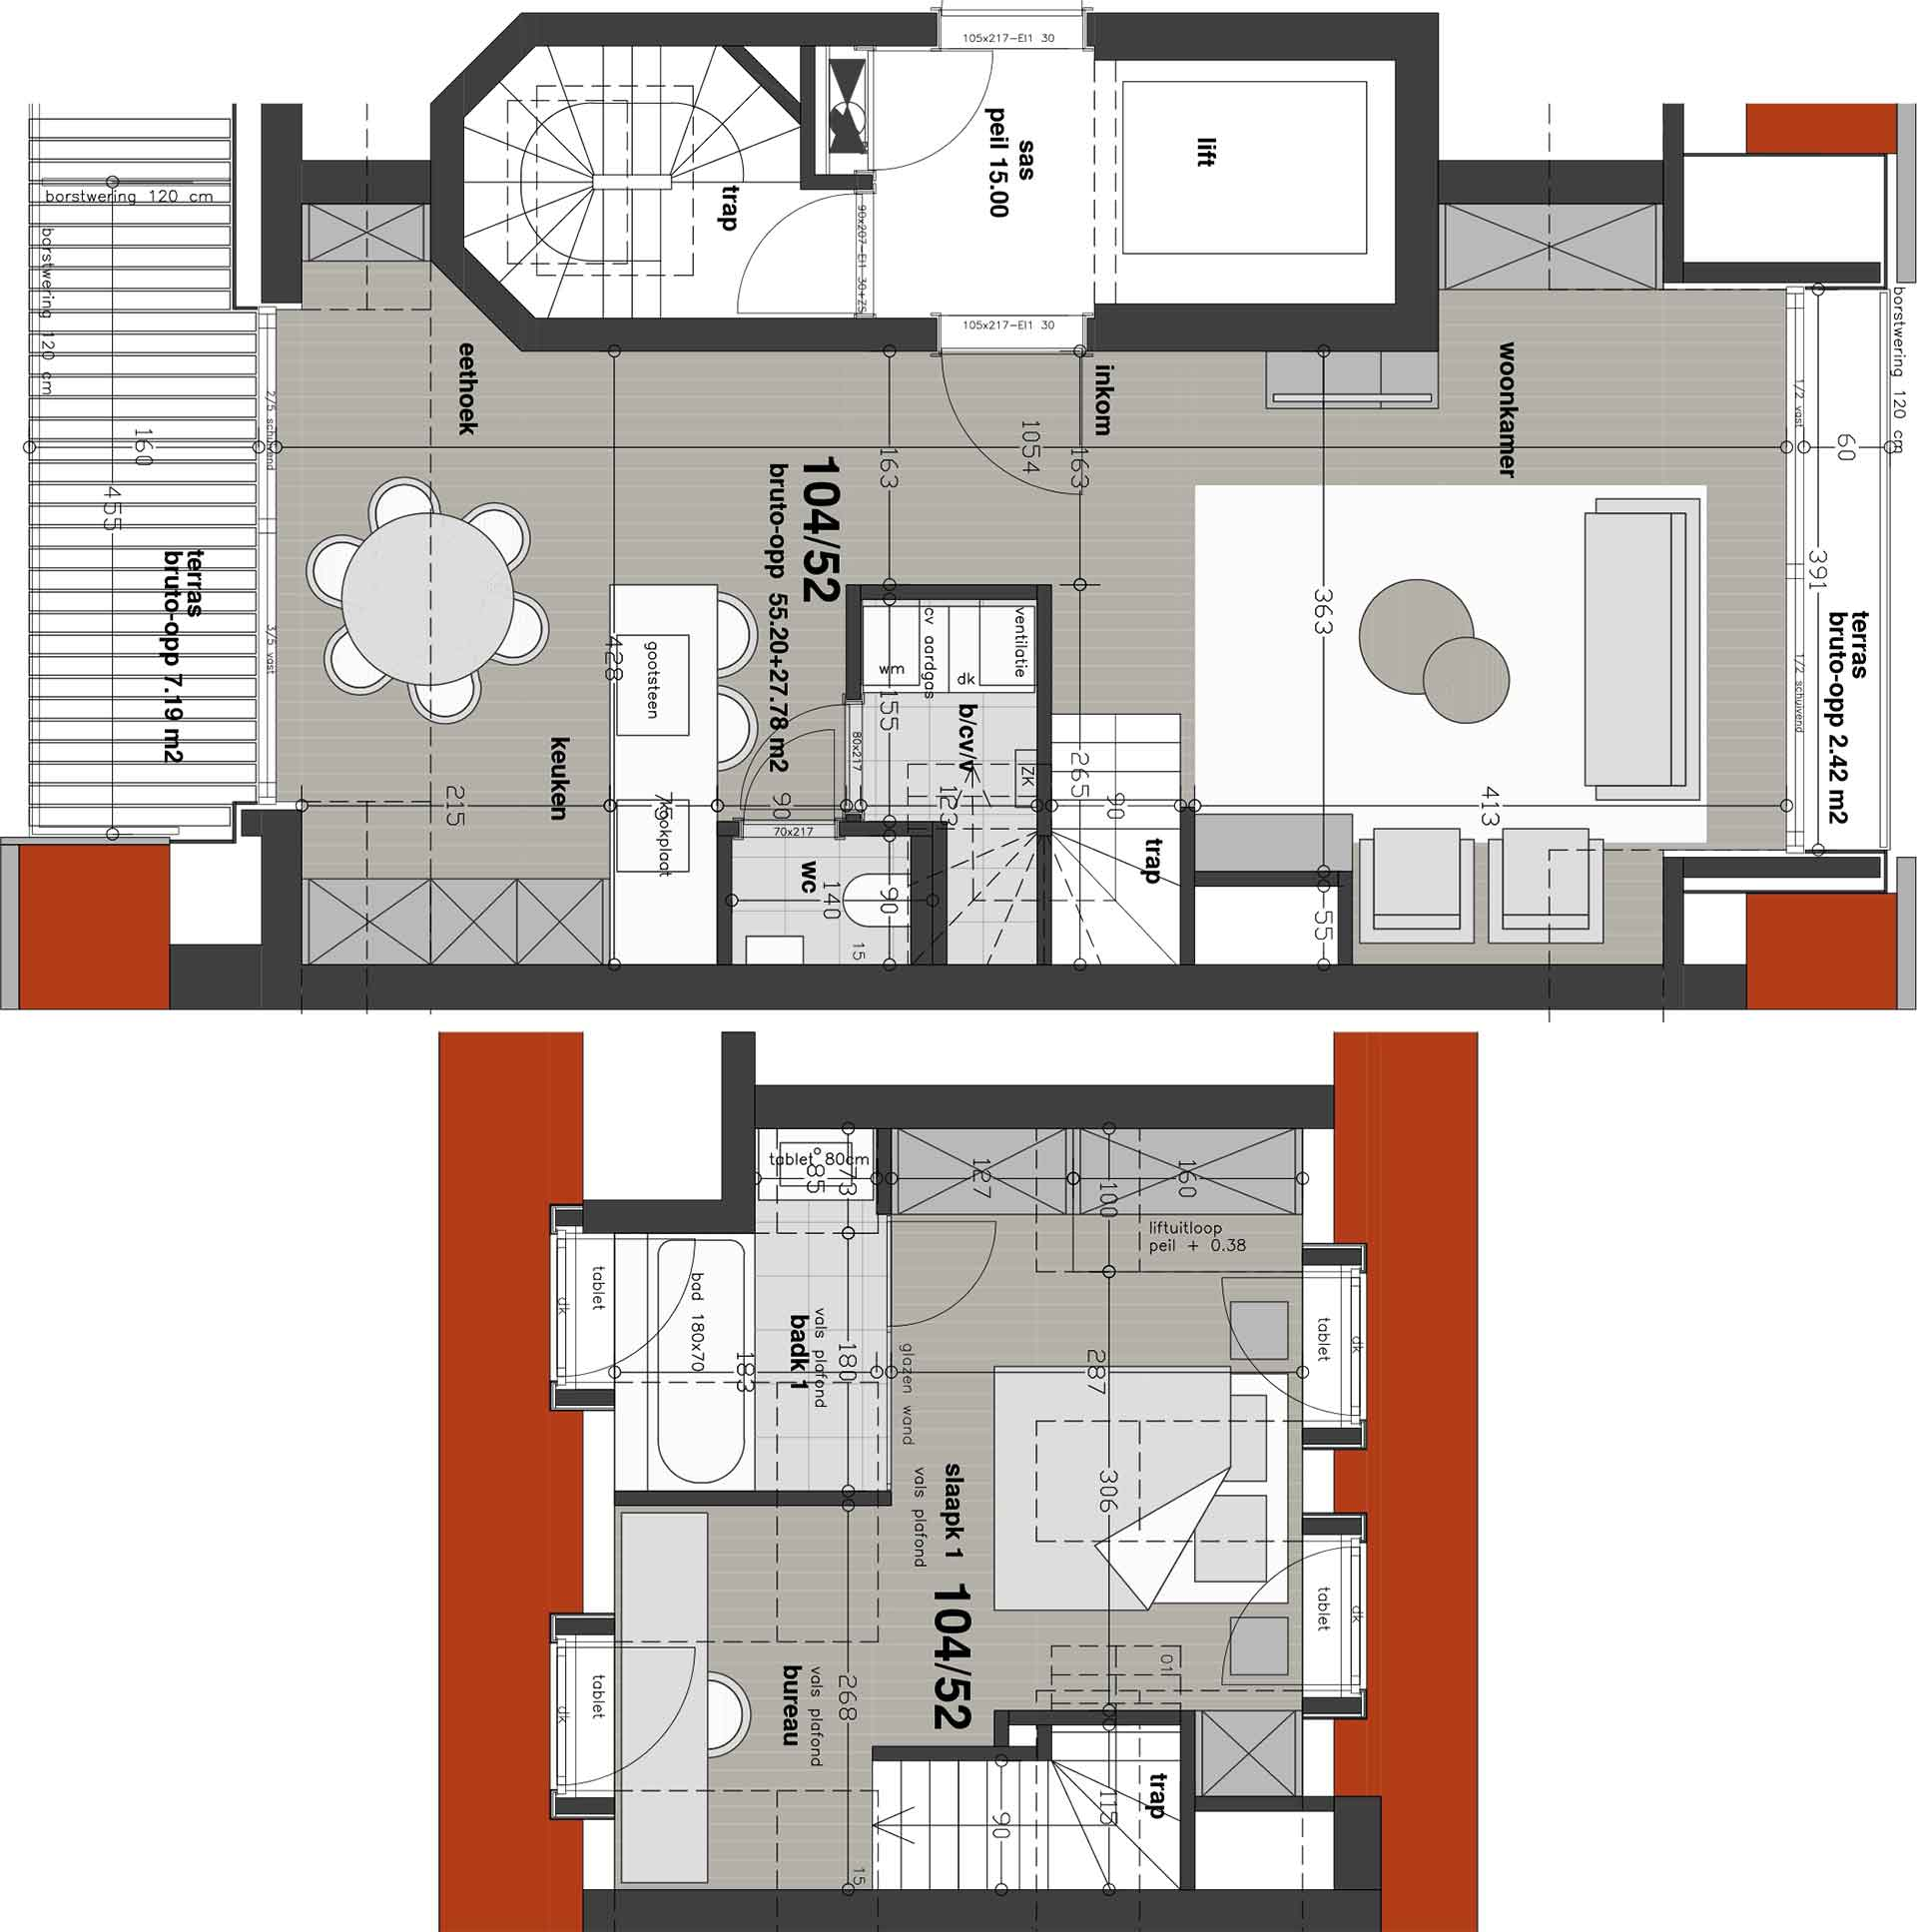 Residentie <br/> Chagall - image appartement-te-koop-knokke-heist-residentie-chagall-plan-52 on https://hoprom.be